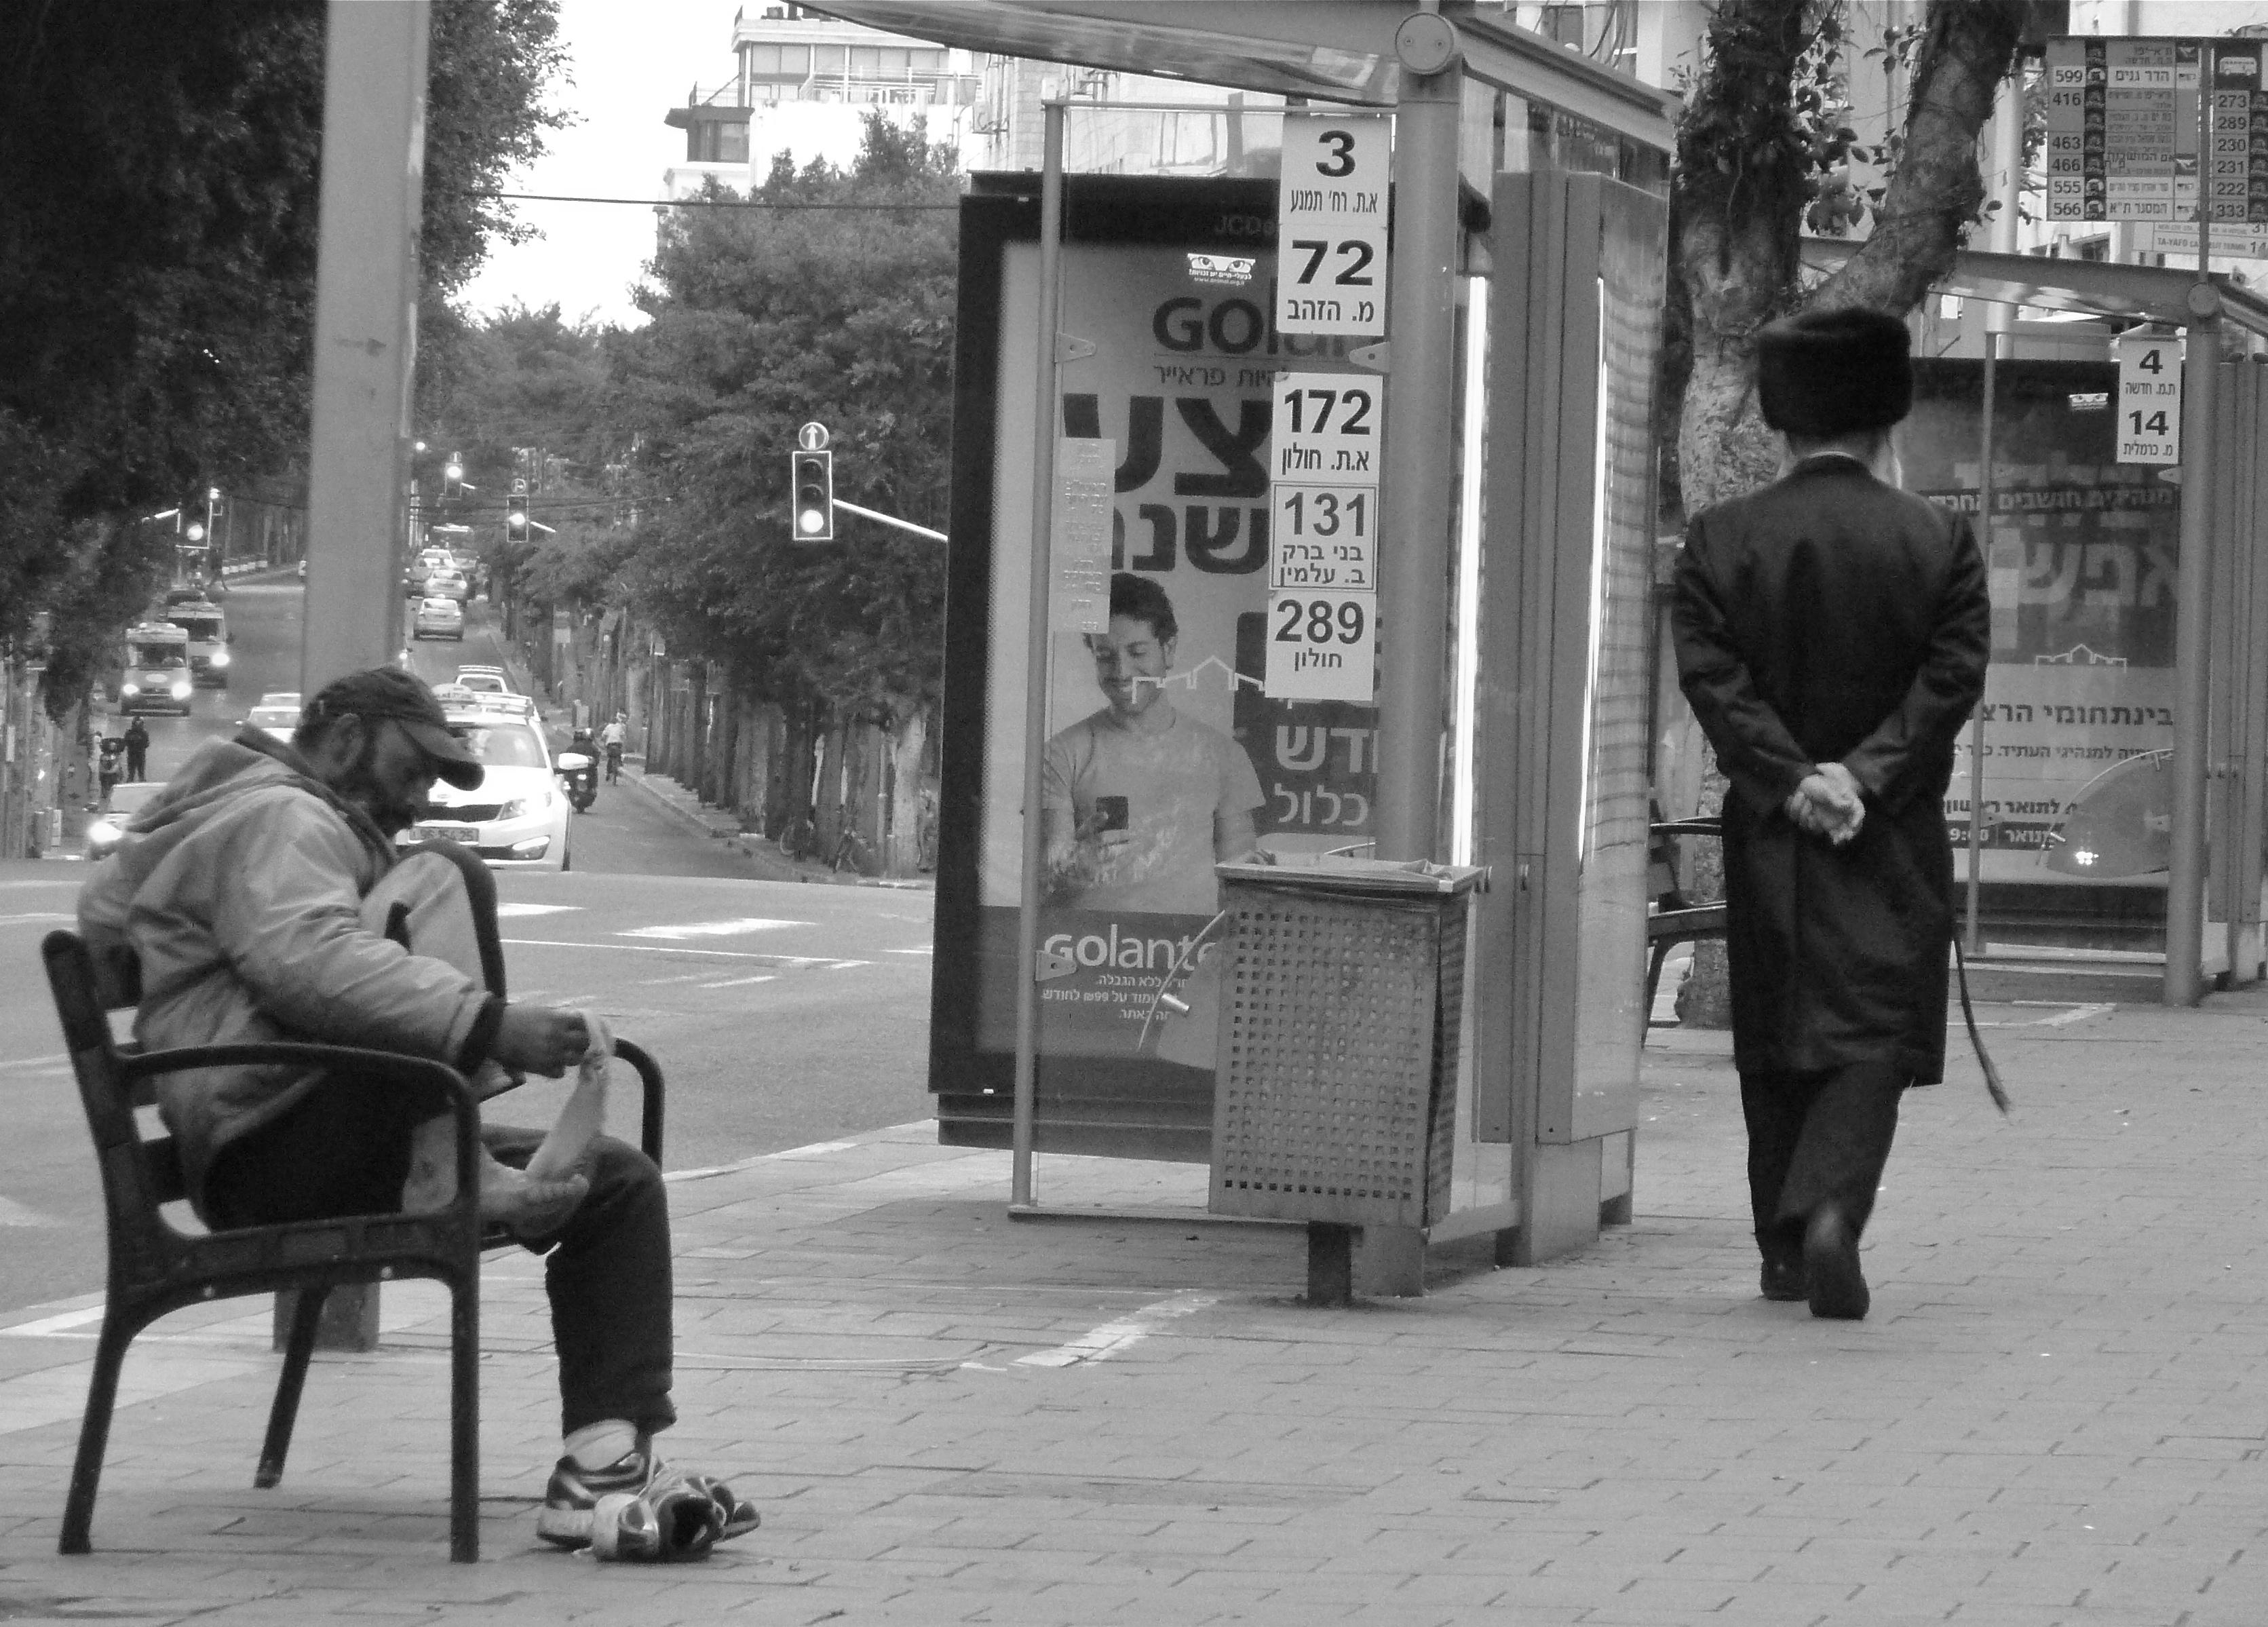 Tel-Aviv shabbatique | Reportage photo